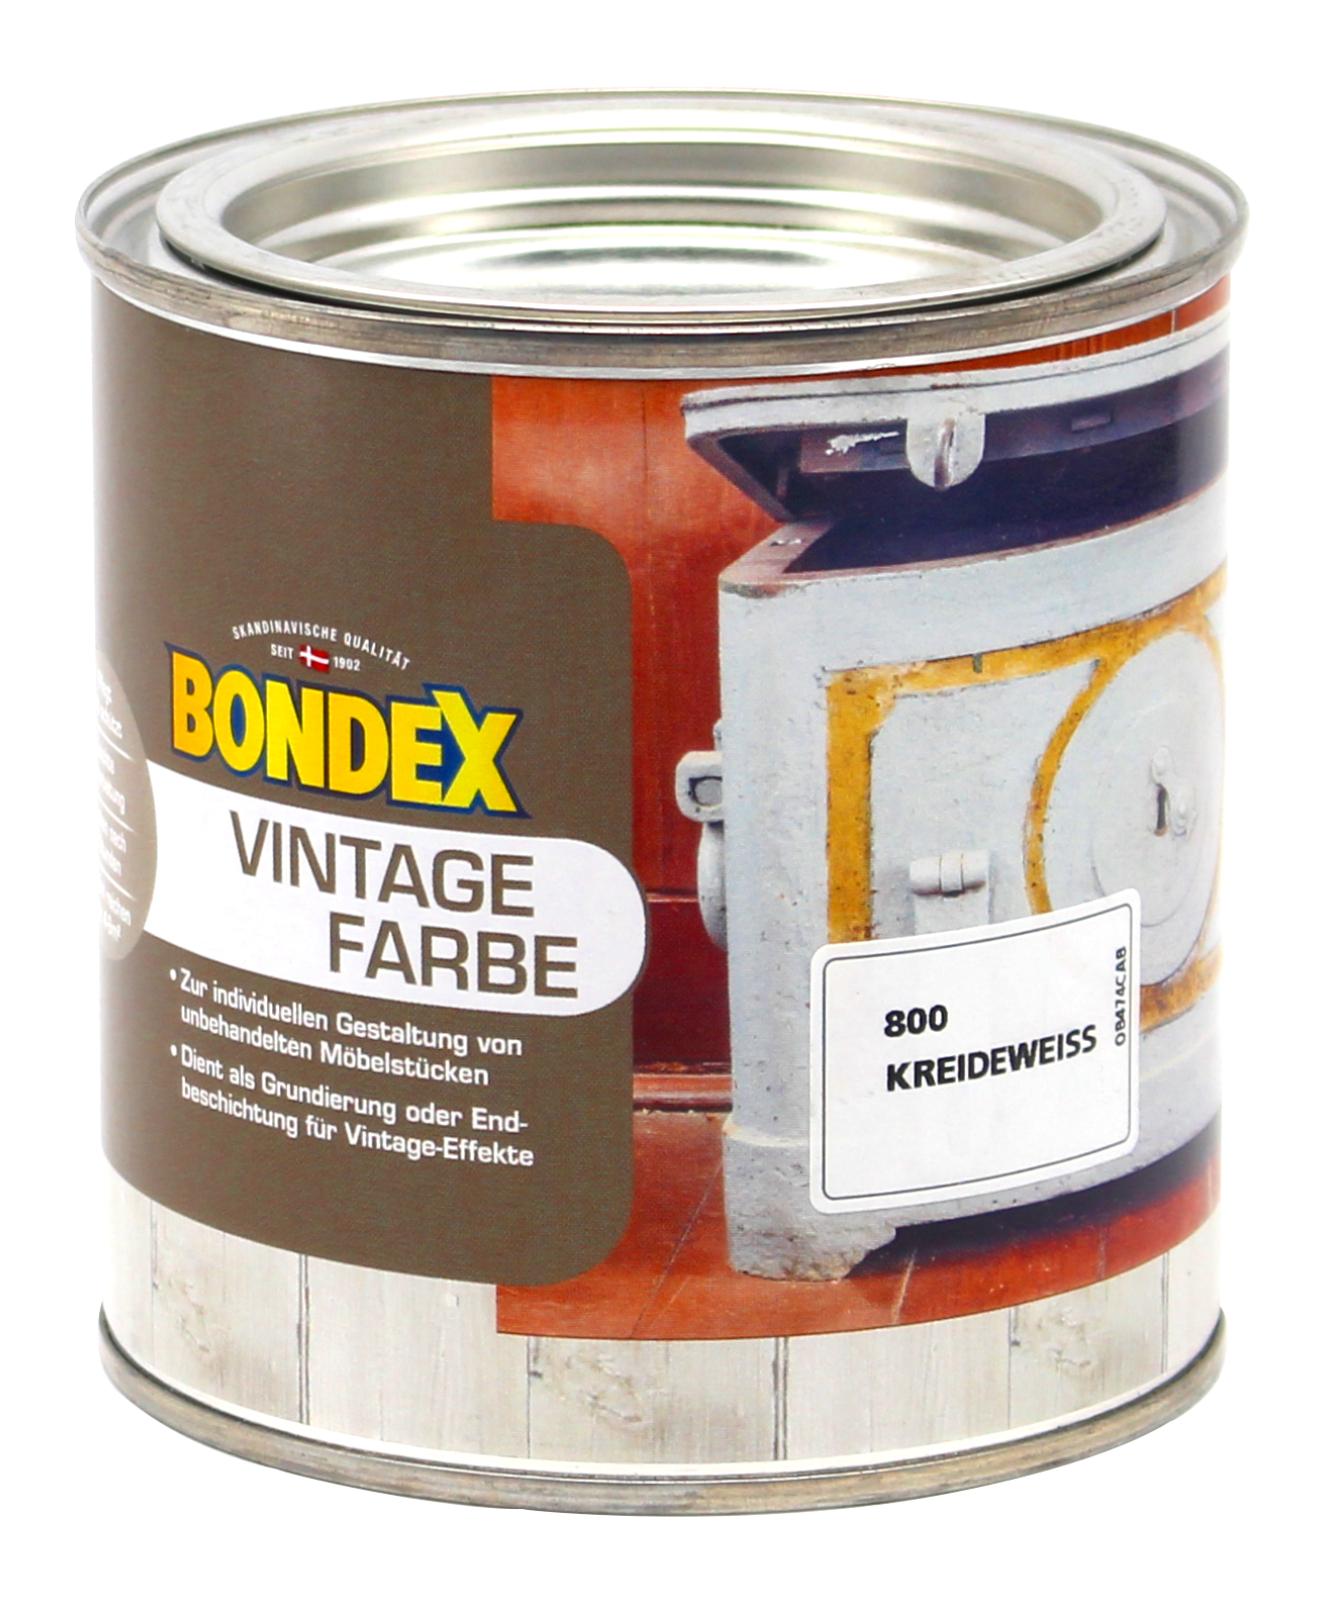 bondex vintage farbe kreideweiss holzfarbe holz m bel. Black Bedroom Furniture Sets. Home Design Ideas